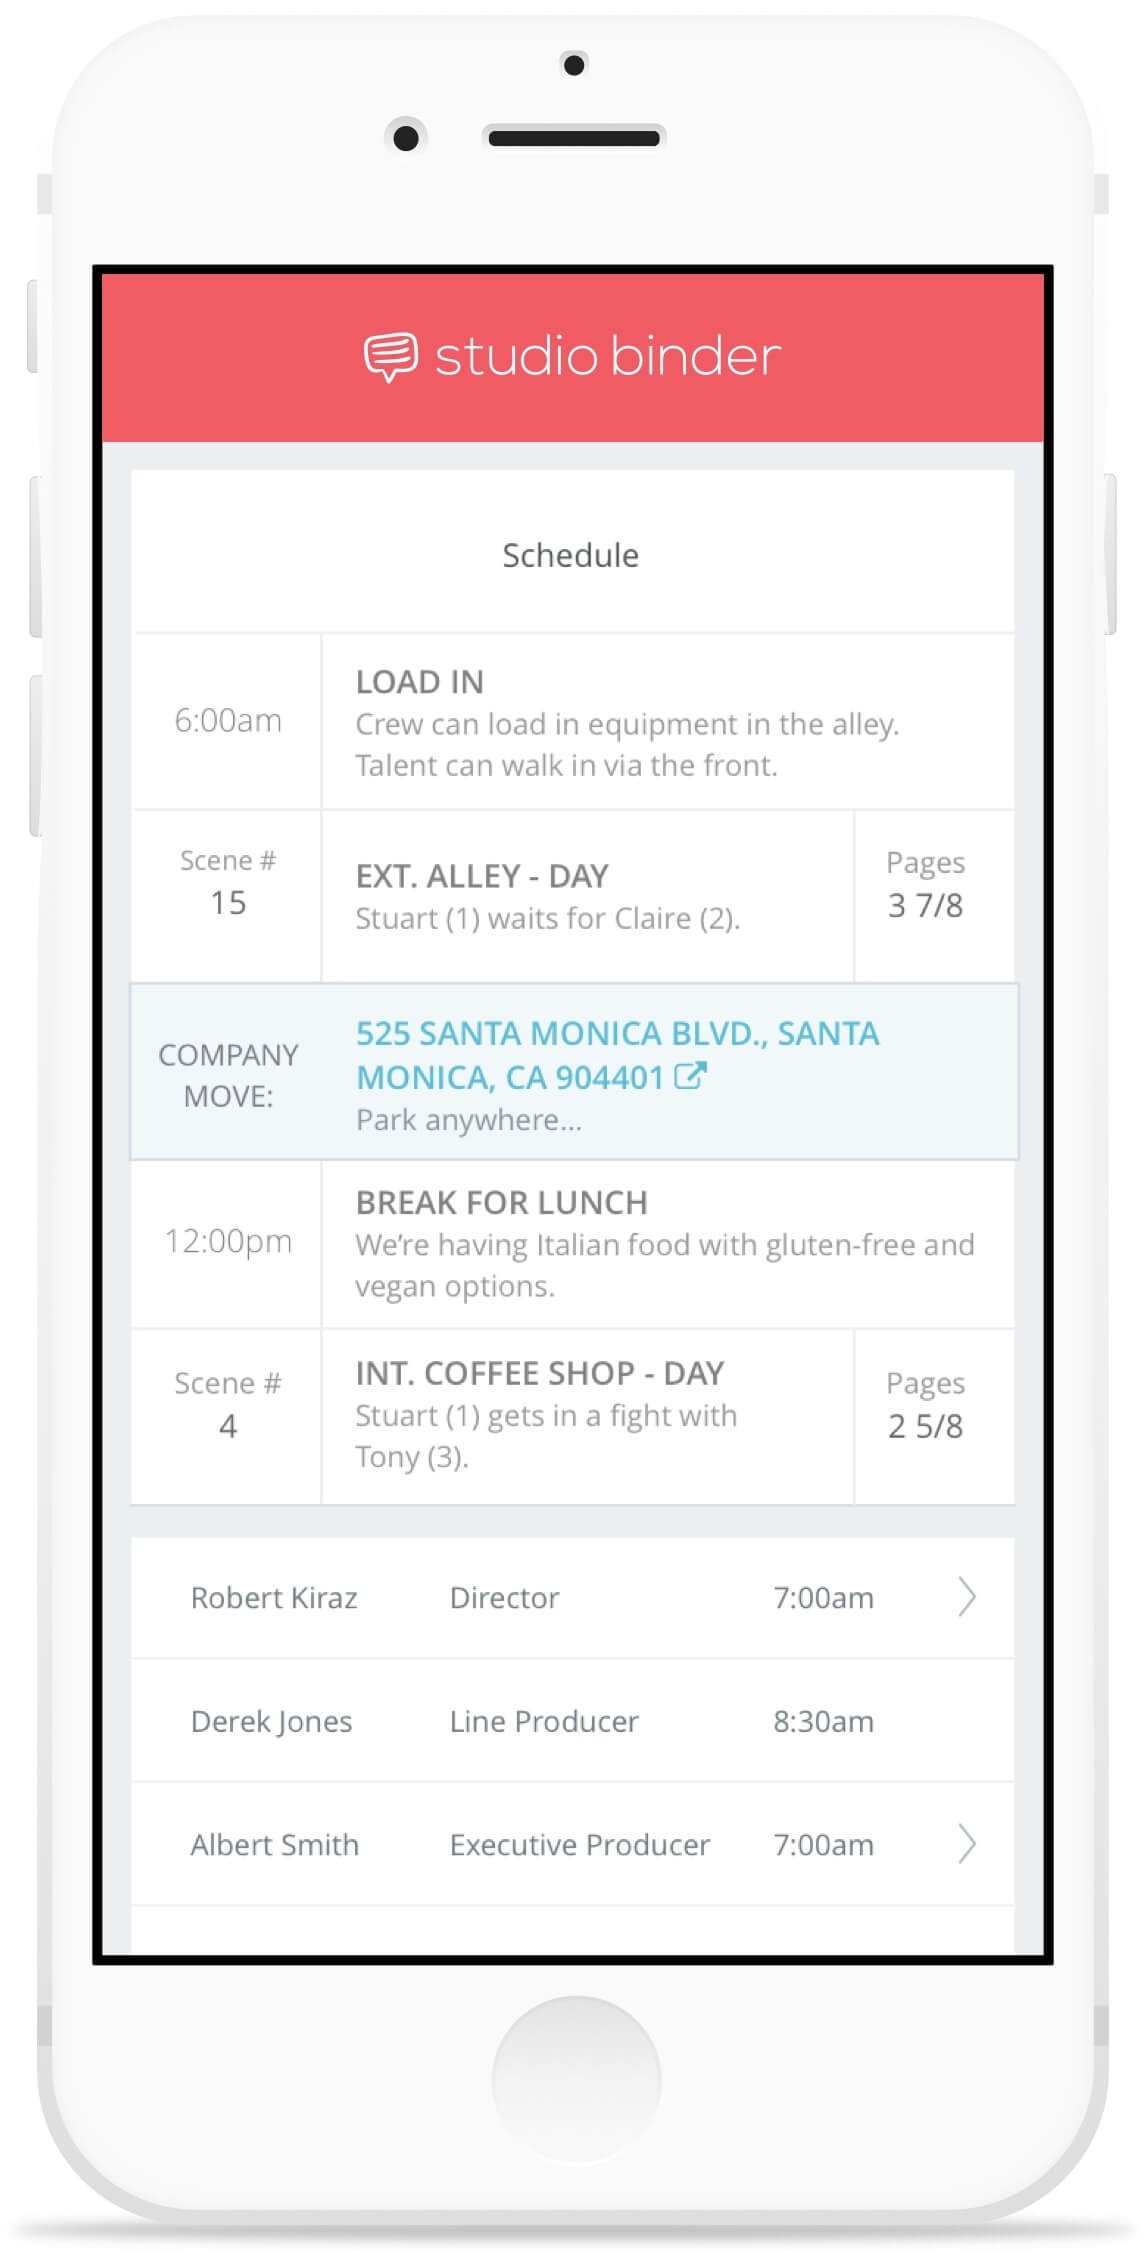 studiobinder-call-sheet-mobile-schedule-iphone-branded